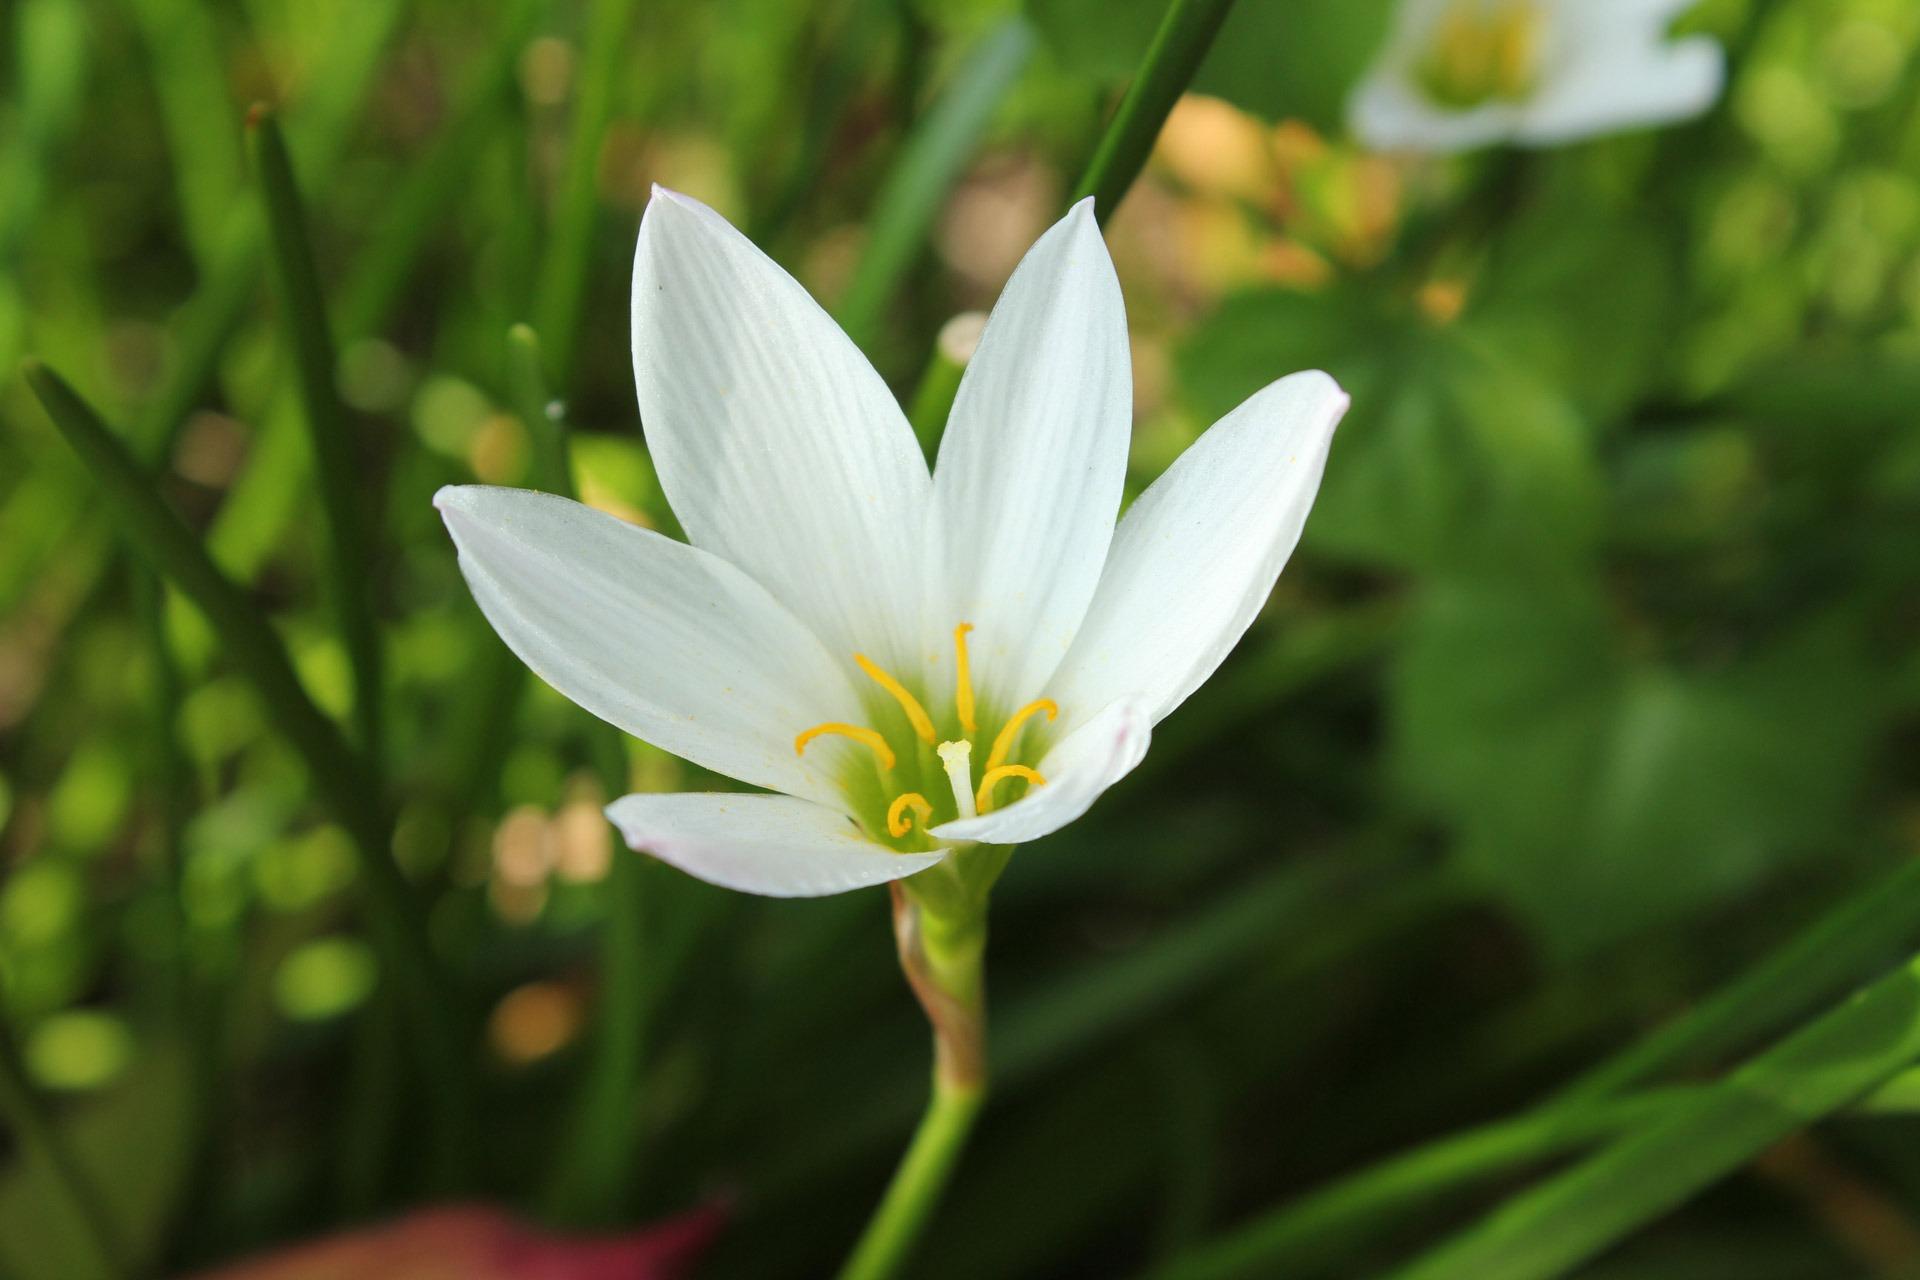 Free Images Nature Blossom Petal Botany Flora White Flower